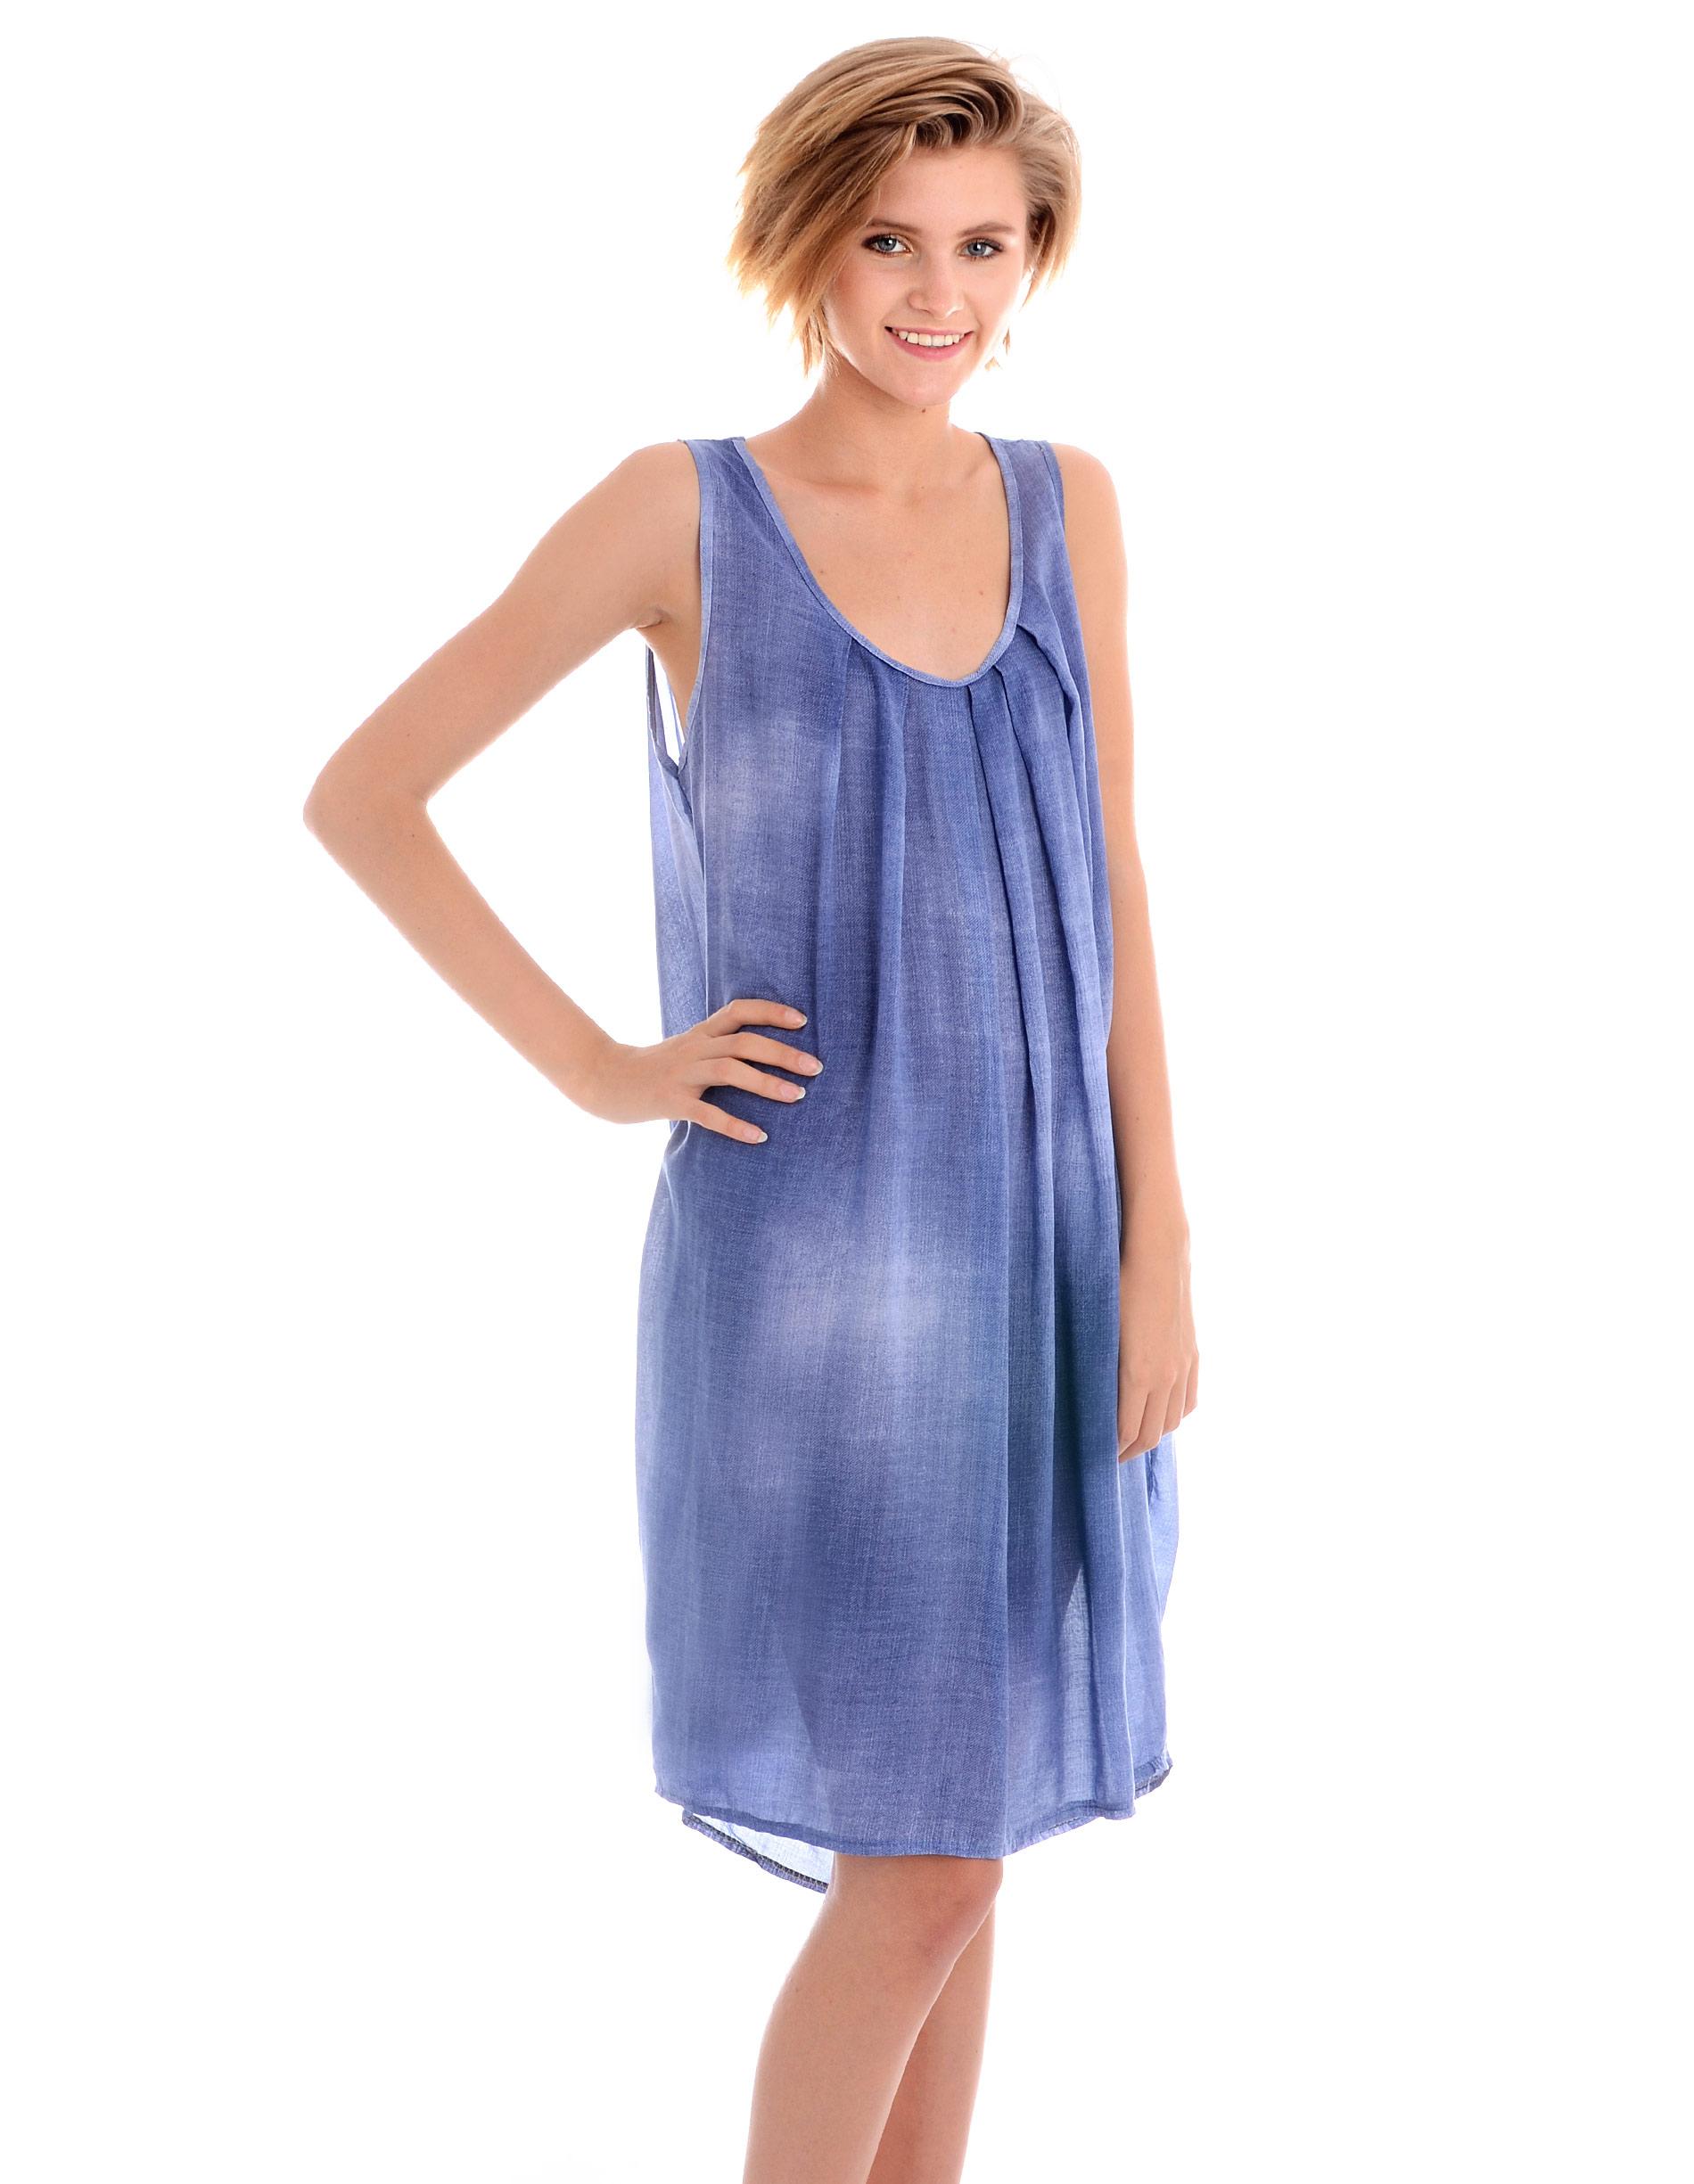 Sukienka - 45-364 JEANS - Unisono